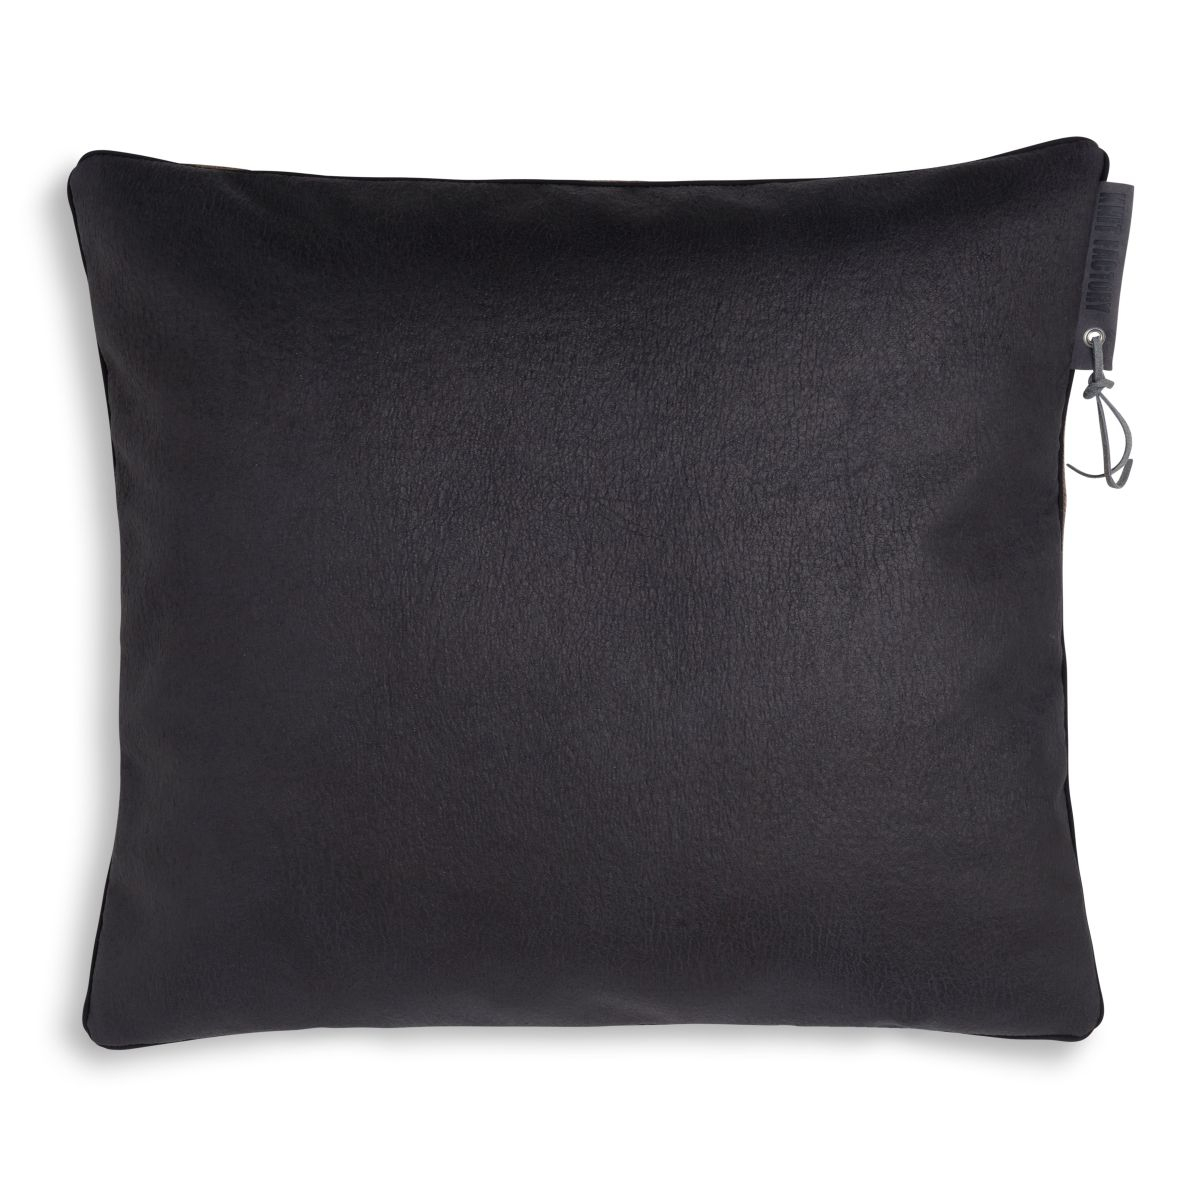 james cushion taupe 50x50